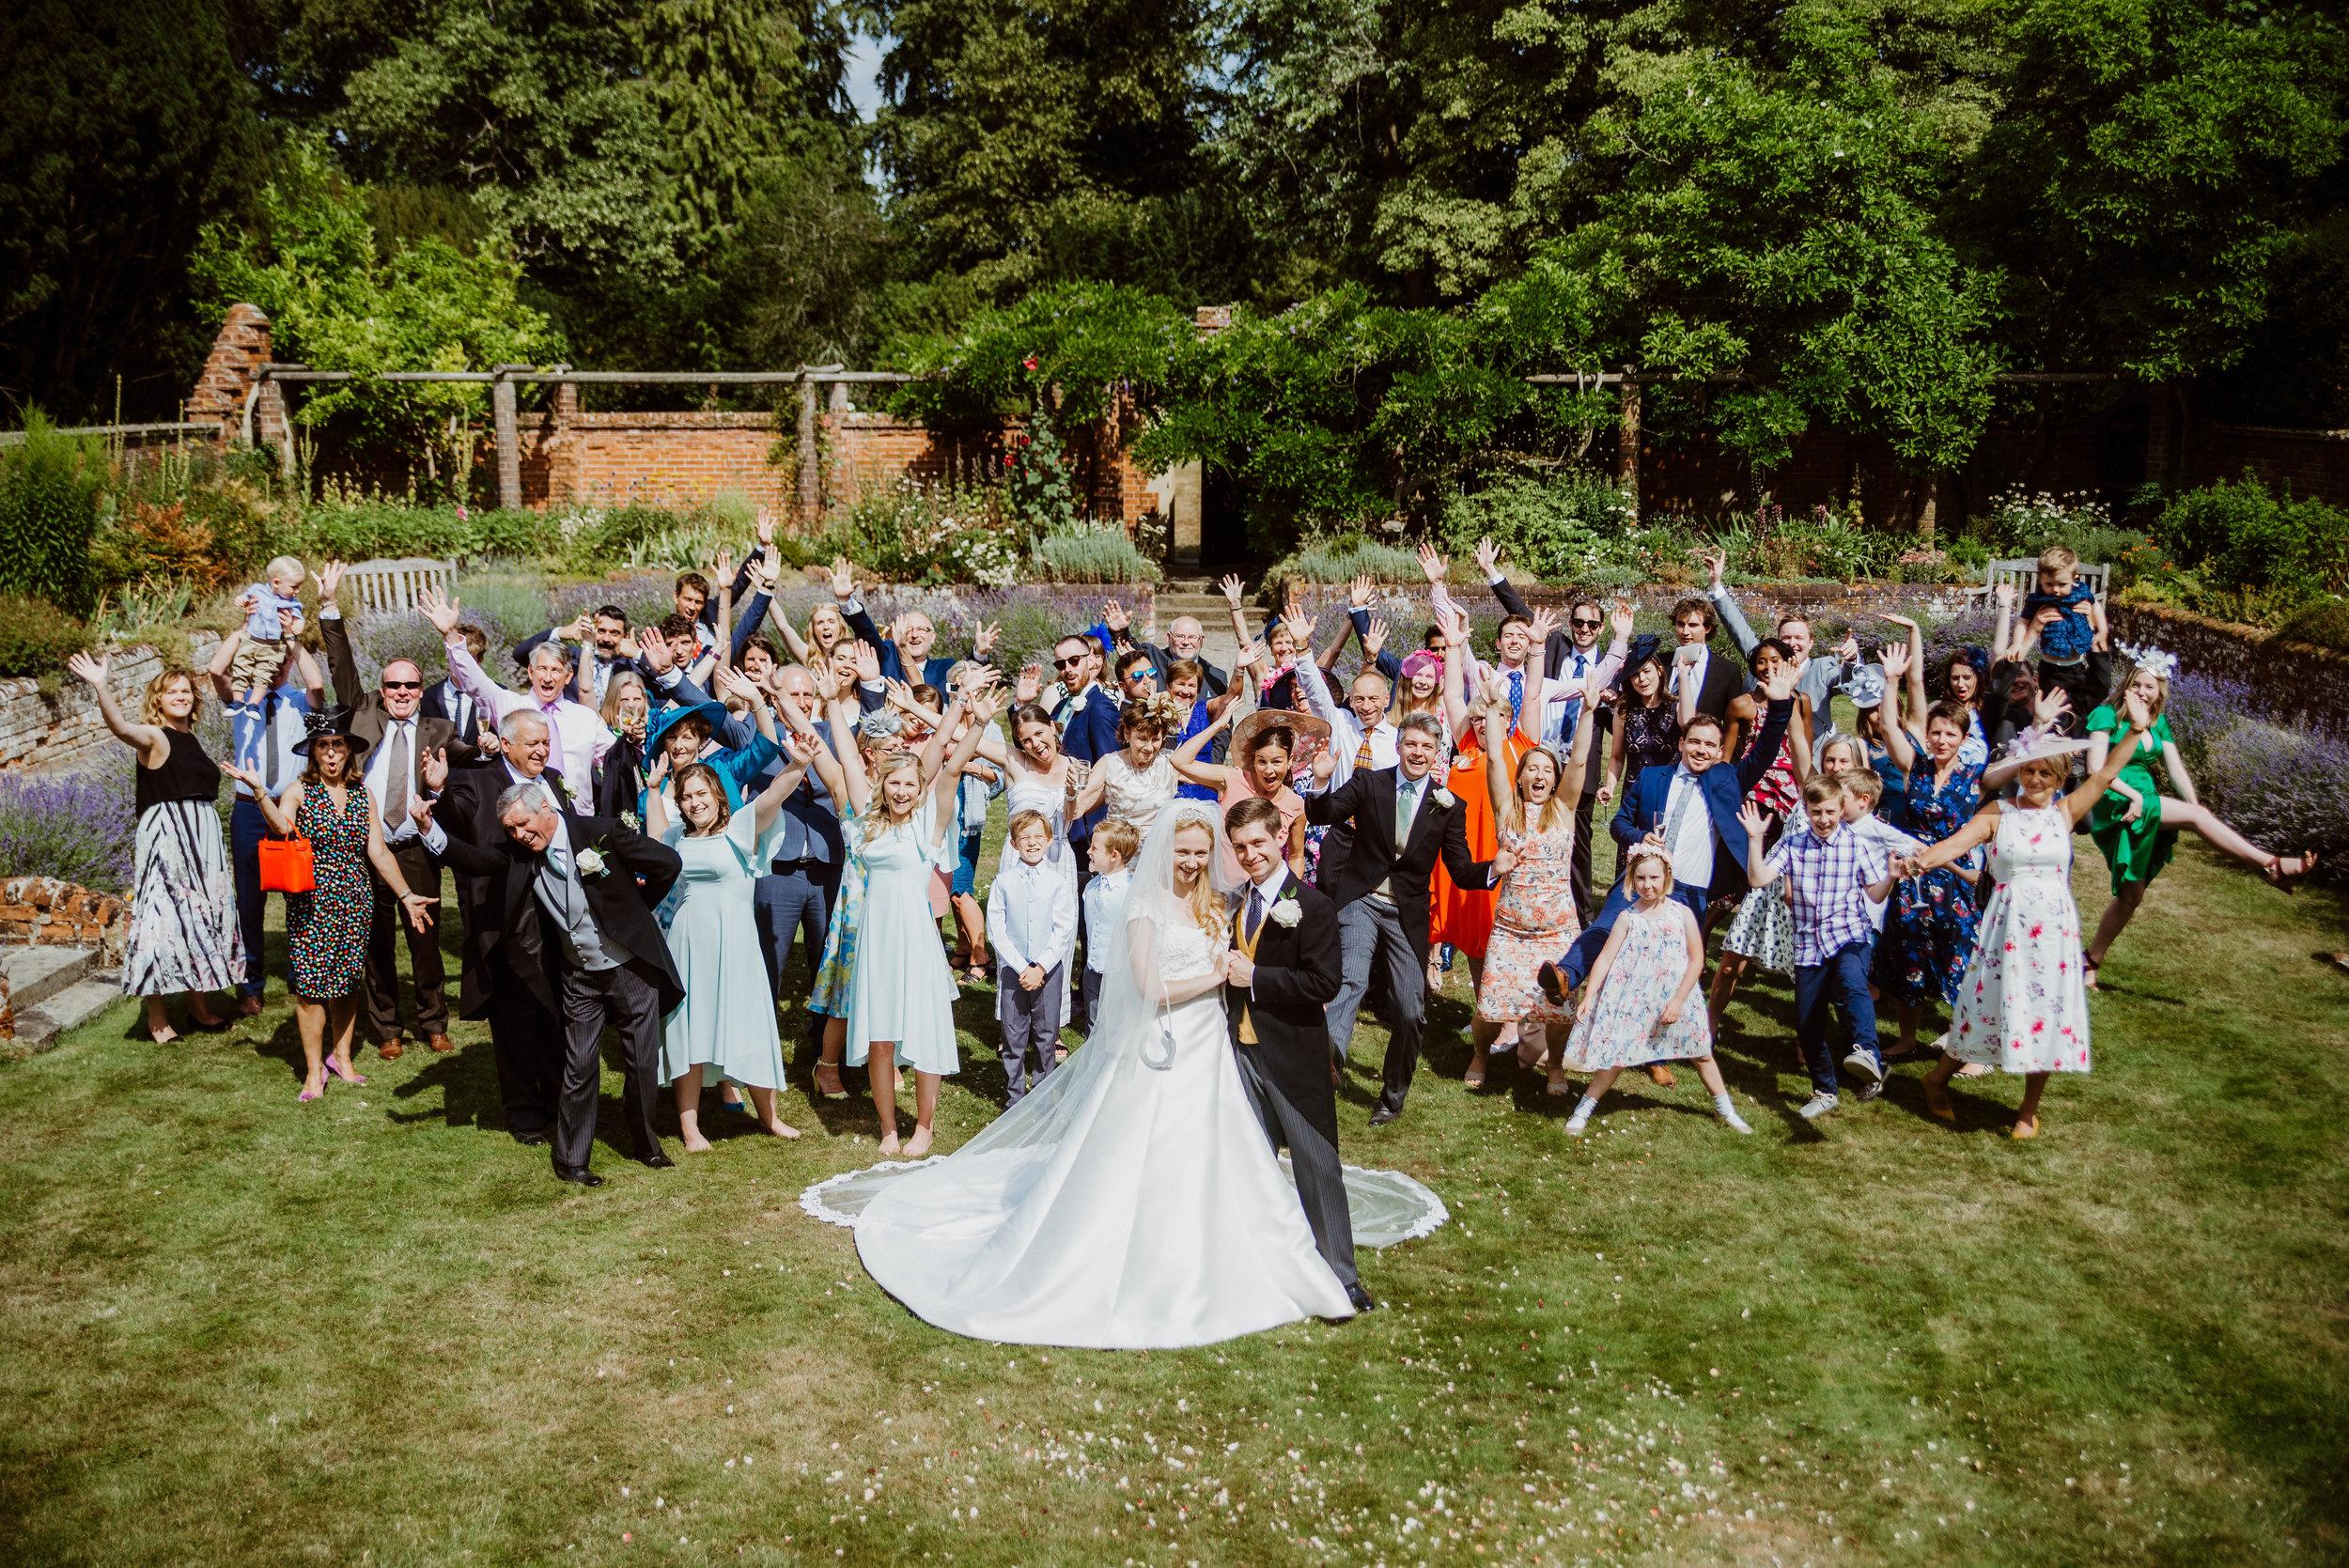 Konjo-Photography-and-videography-suffolk-wedding-photographer-videographer-lanwades-hall-newmarket (9).jpg